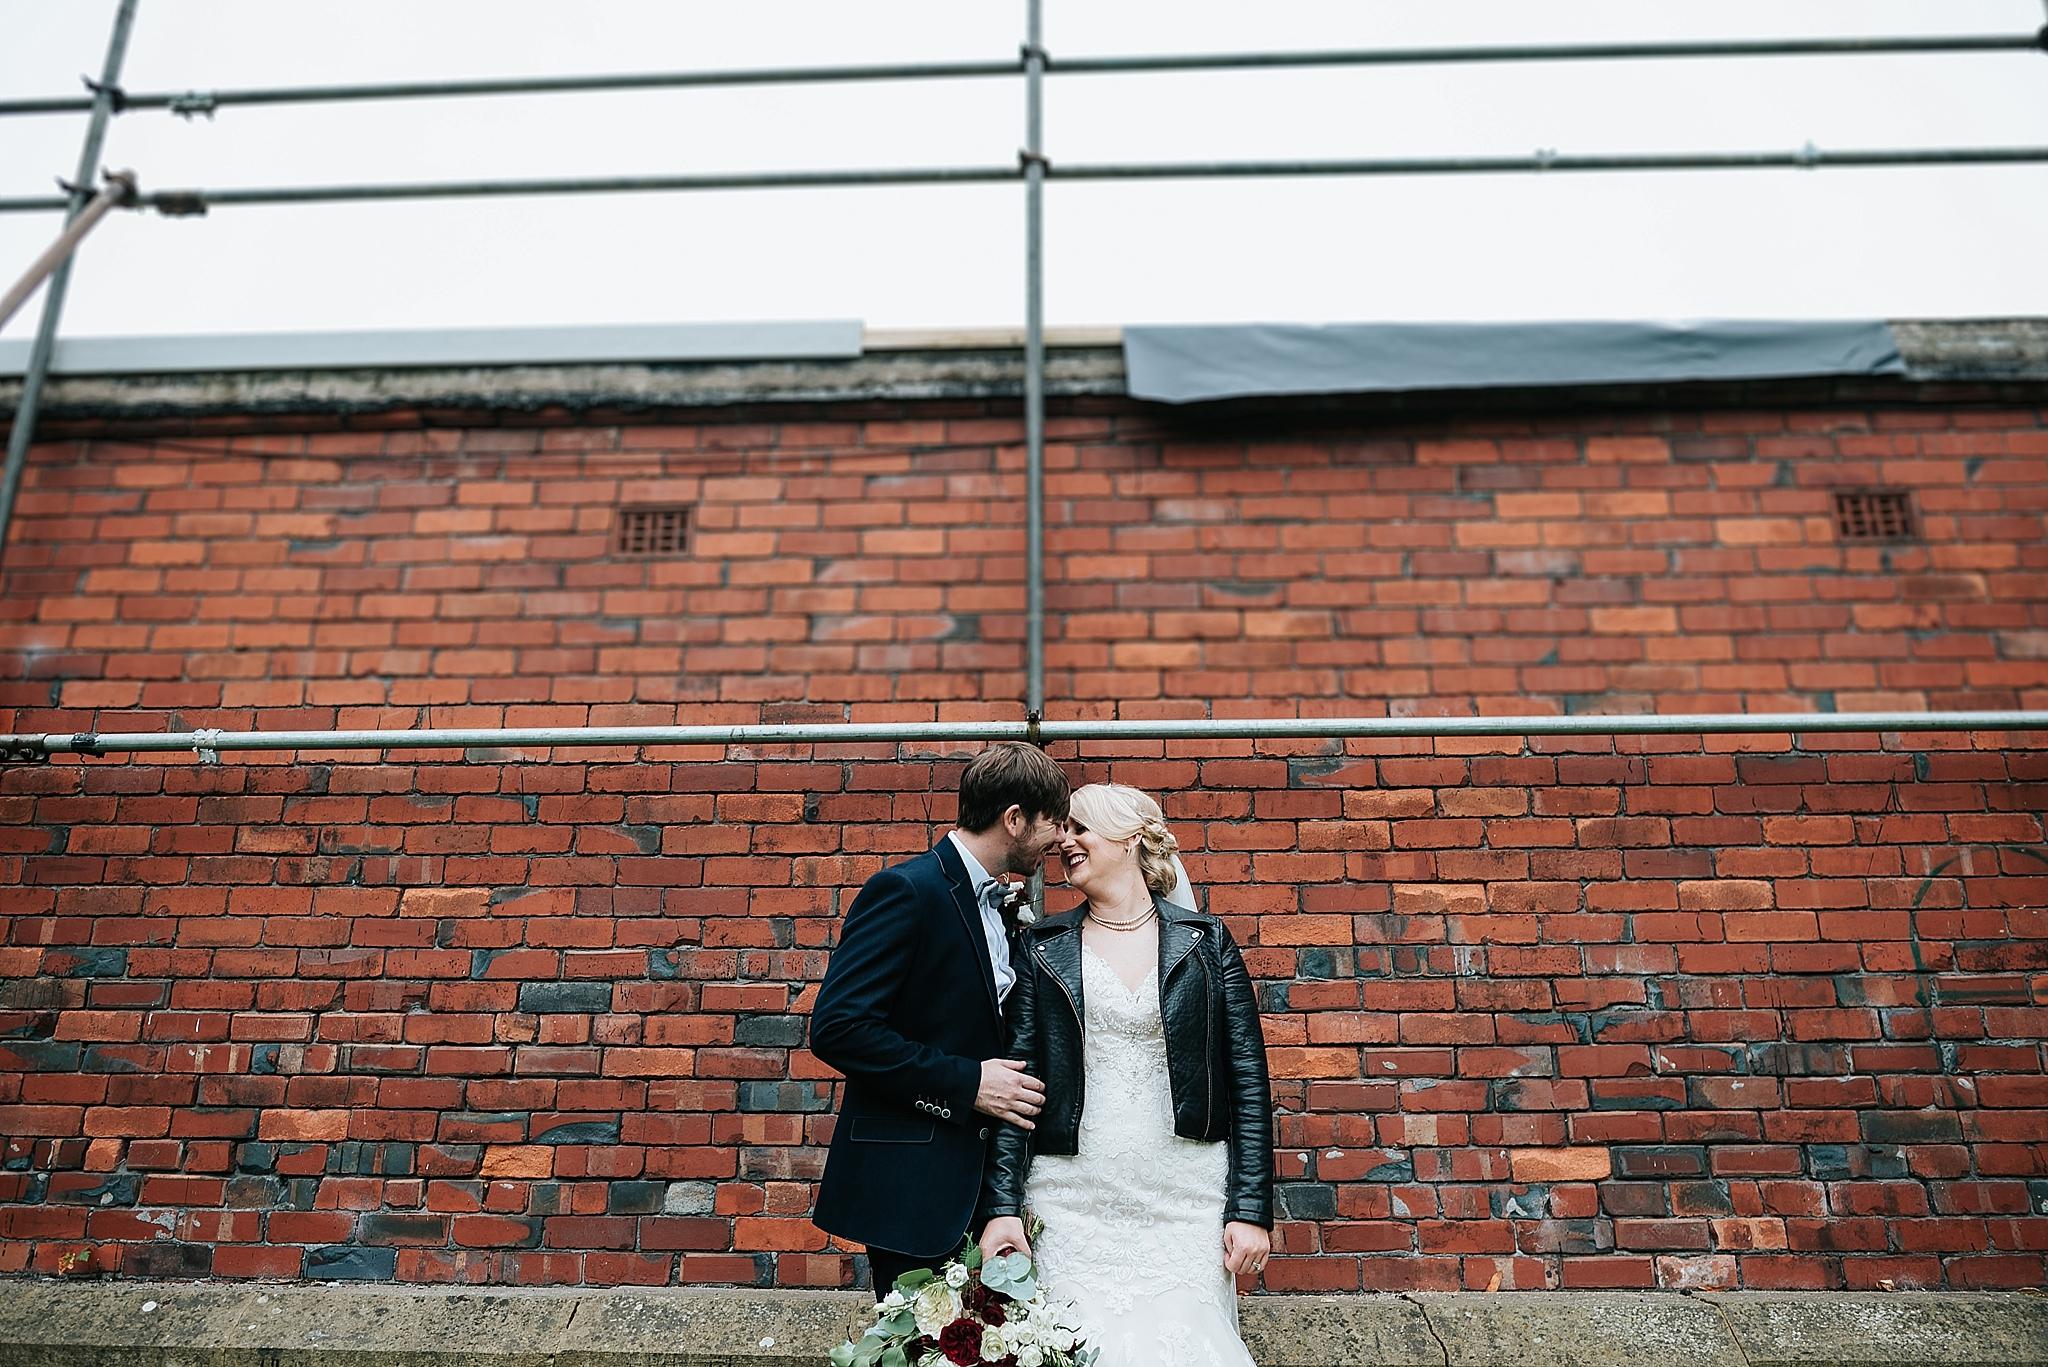 wedding couple in ashton park in lancashire